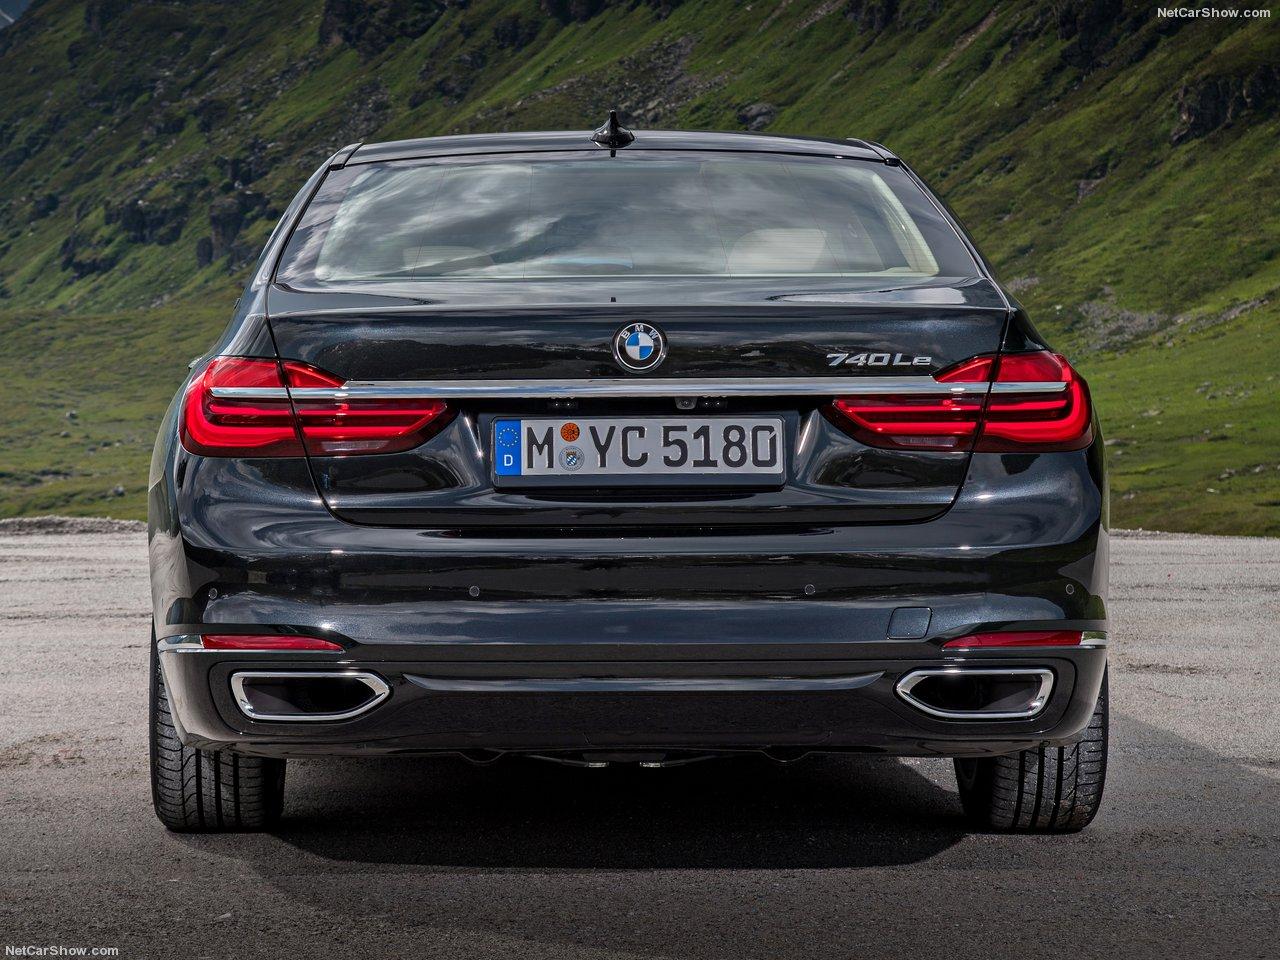 BMW-740Le_xDrive_iPerformance-2017-1280-19